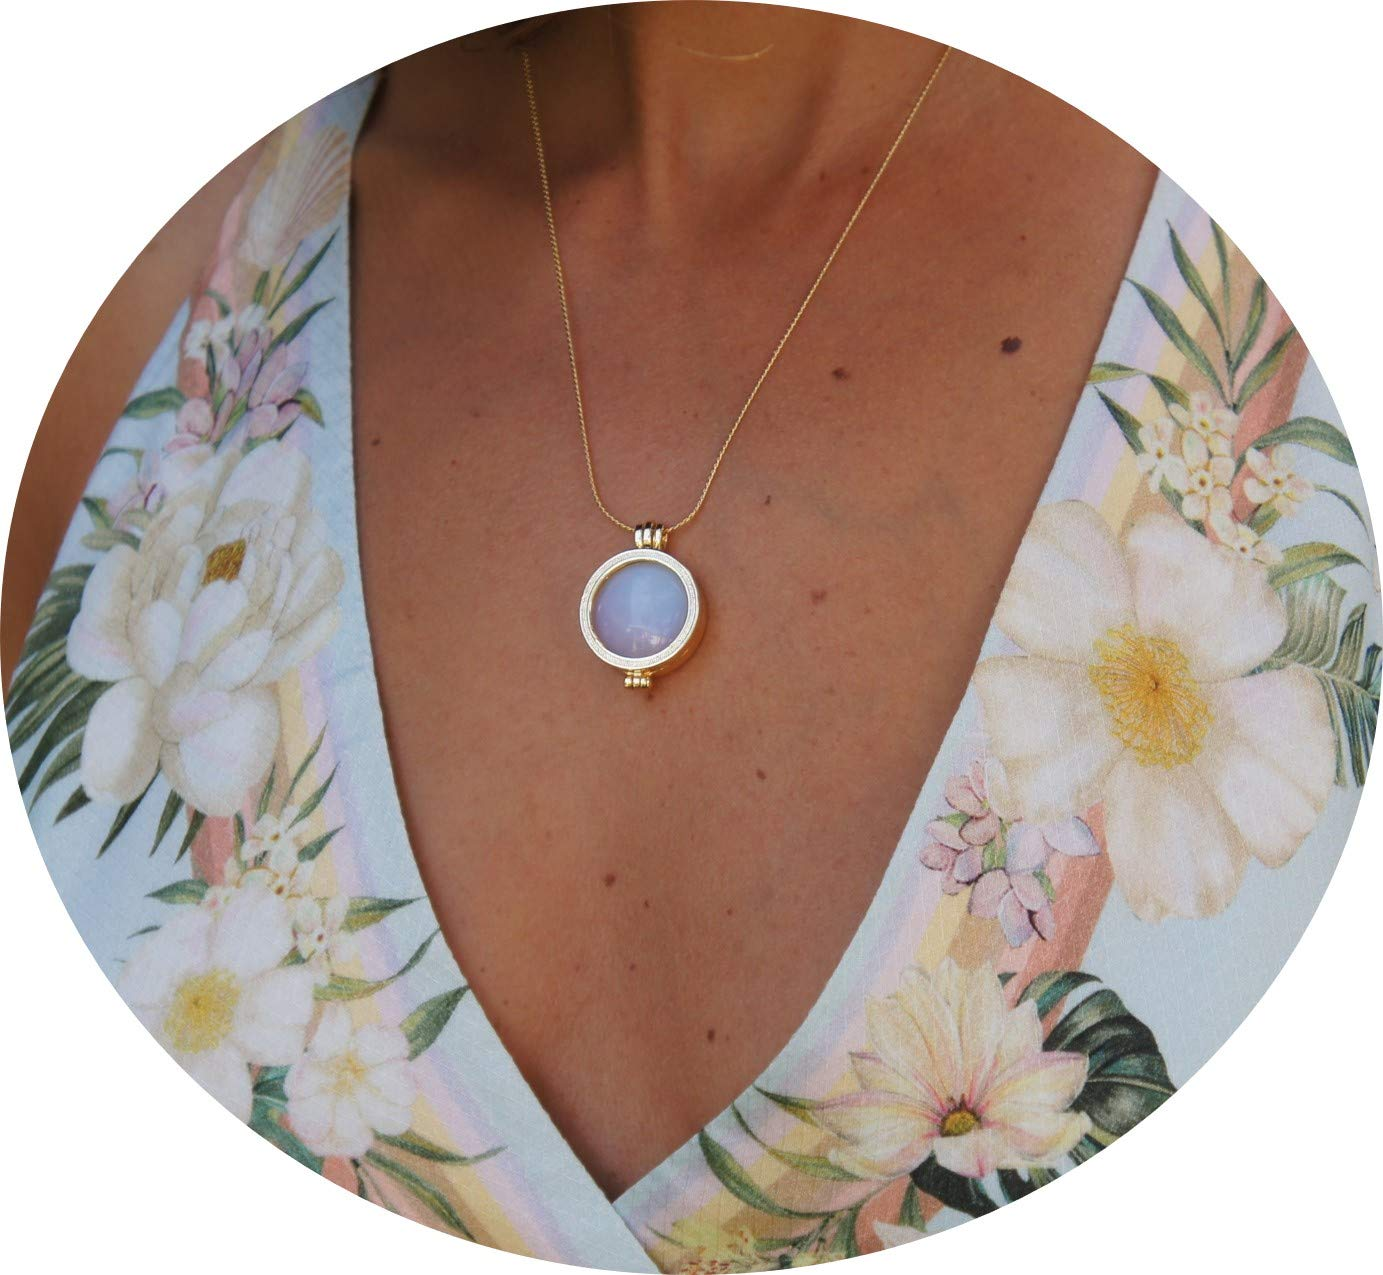 Women Necklace Locket 3 Natural Gemstones Set Green/White/Rose Pendant Jewelry 18''